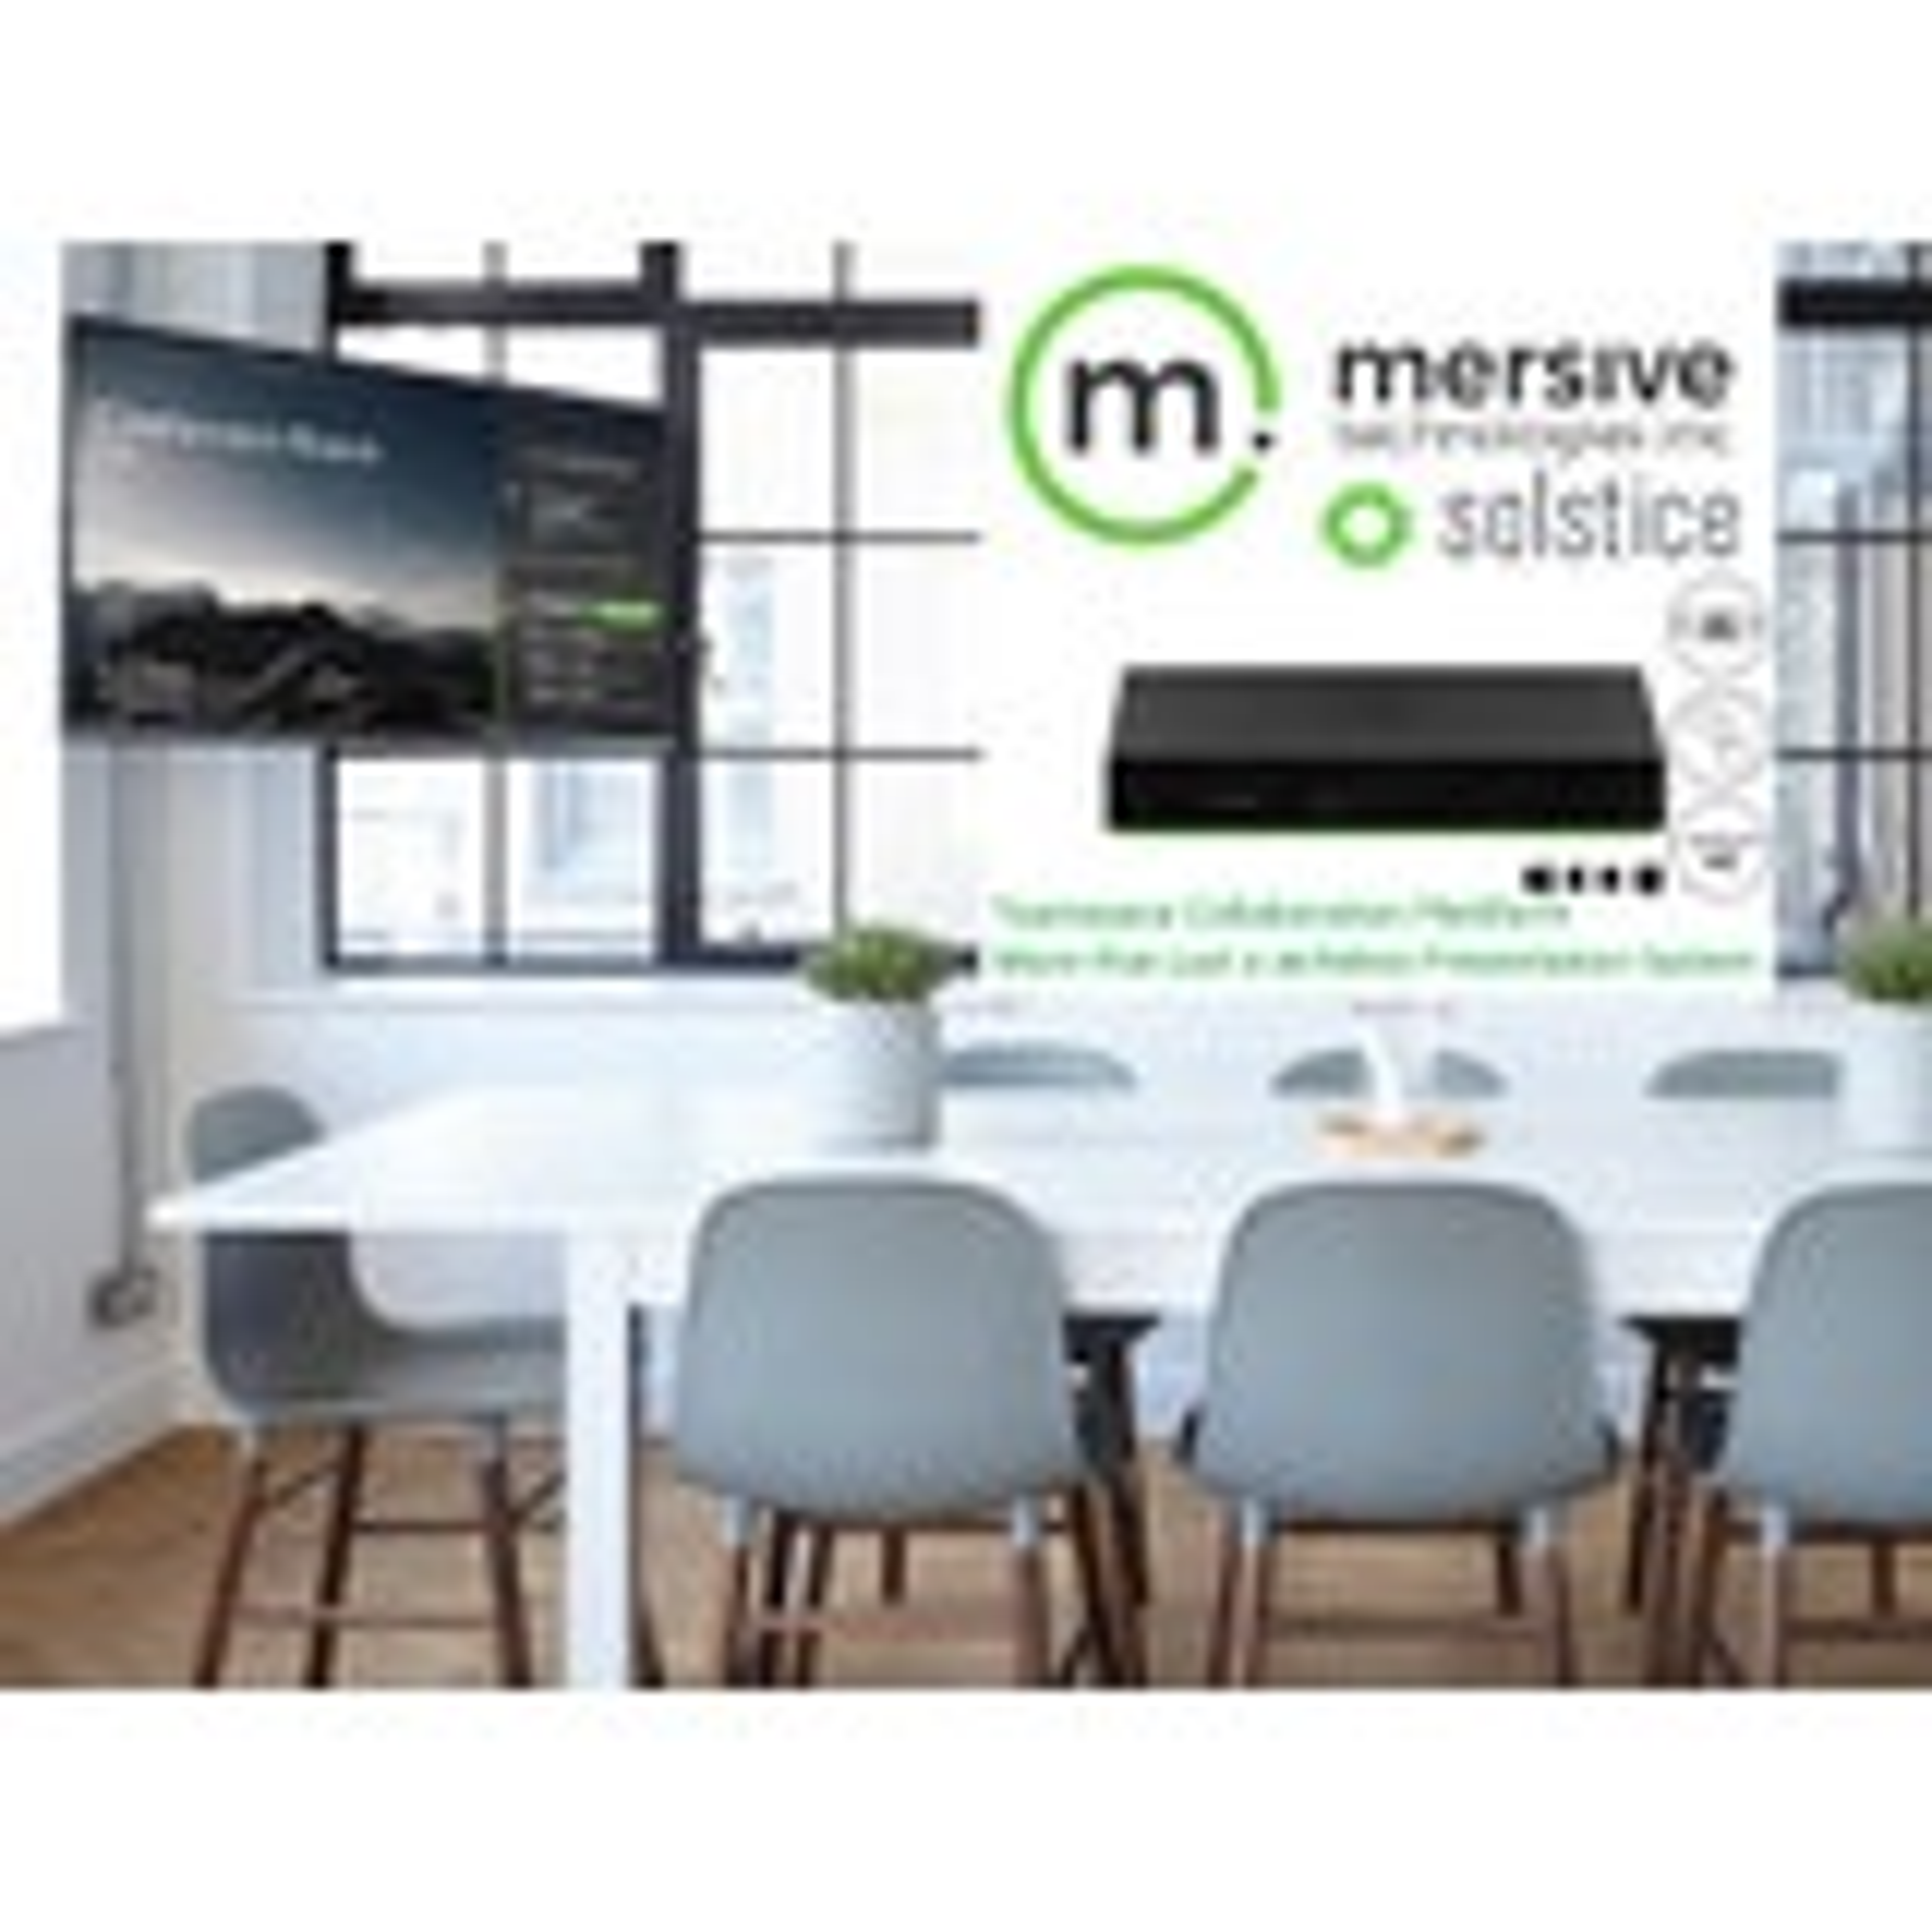 Mersive Solstice Pod Gen3 SGE Enterprise with 5 year Solstice Subscription